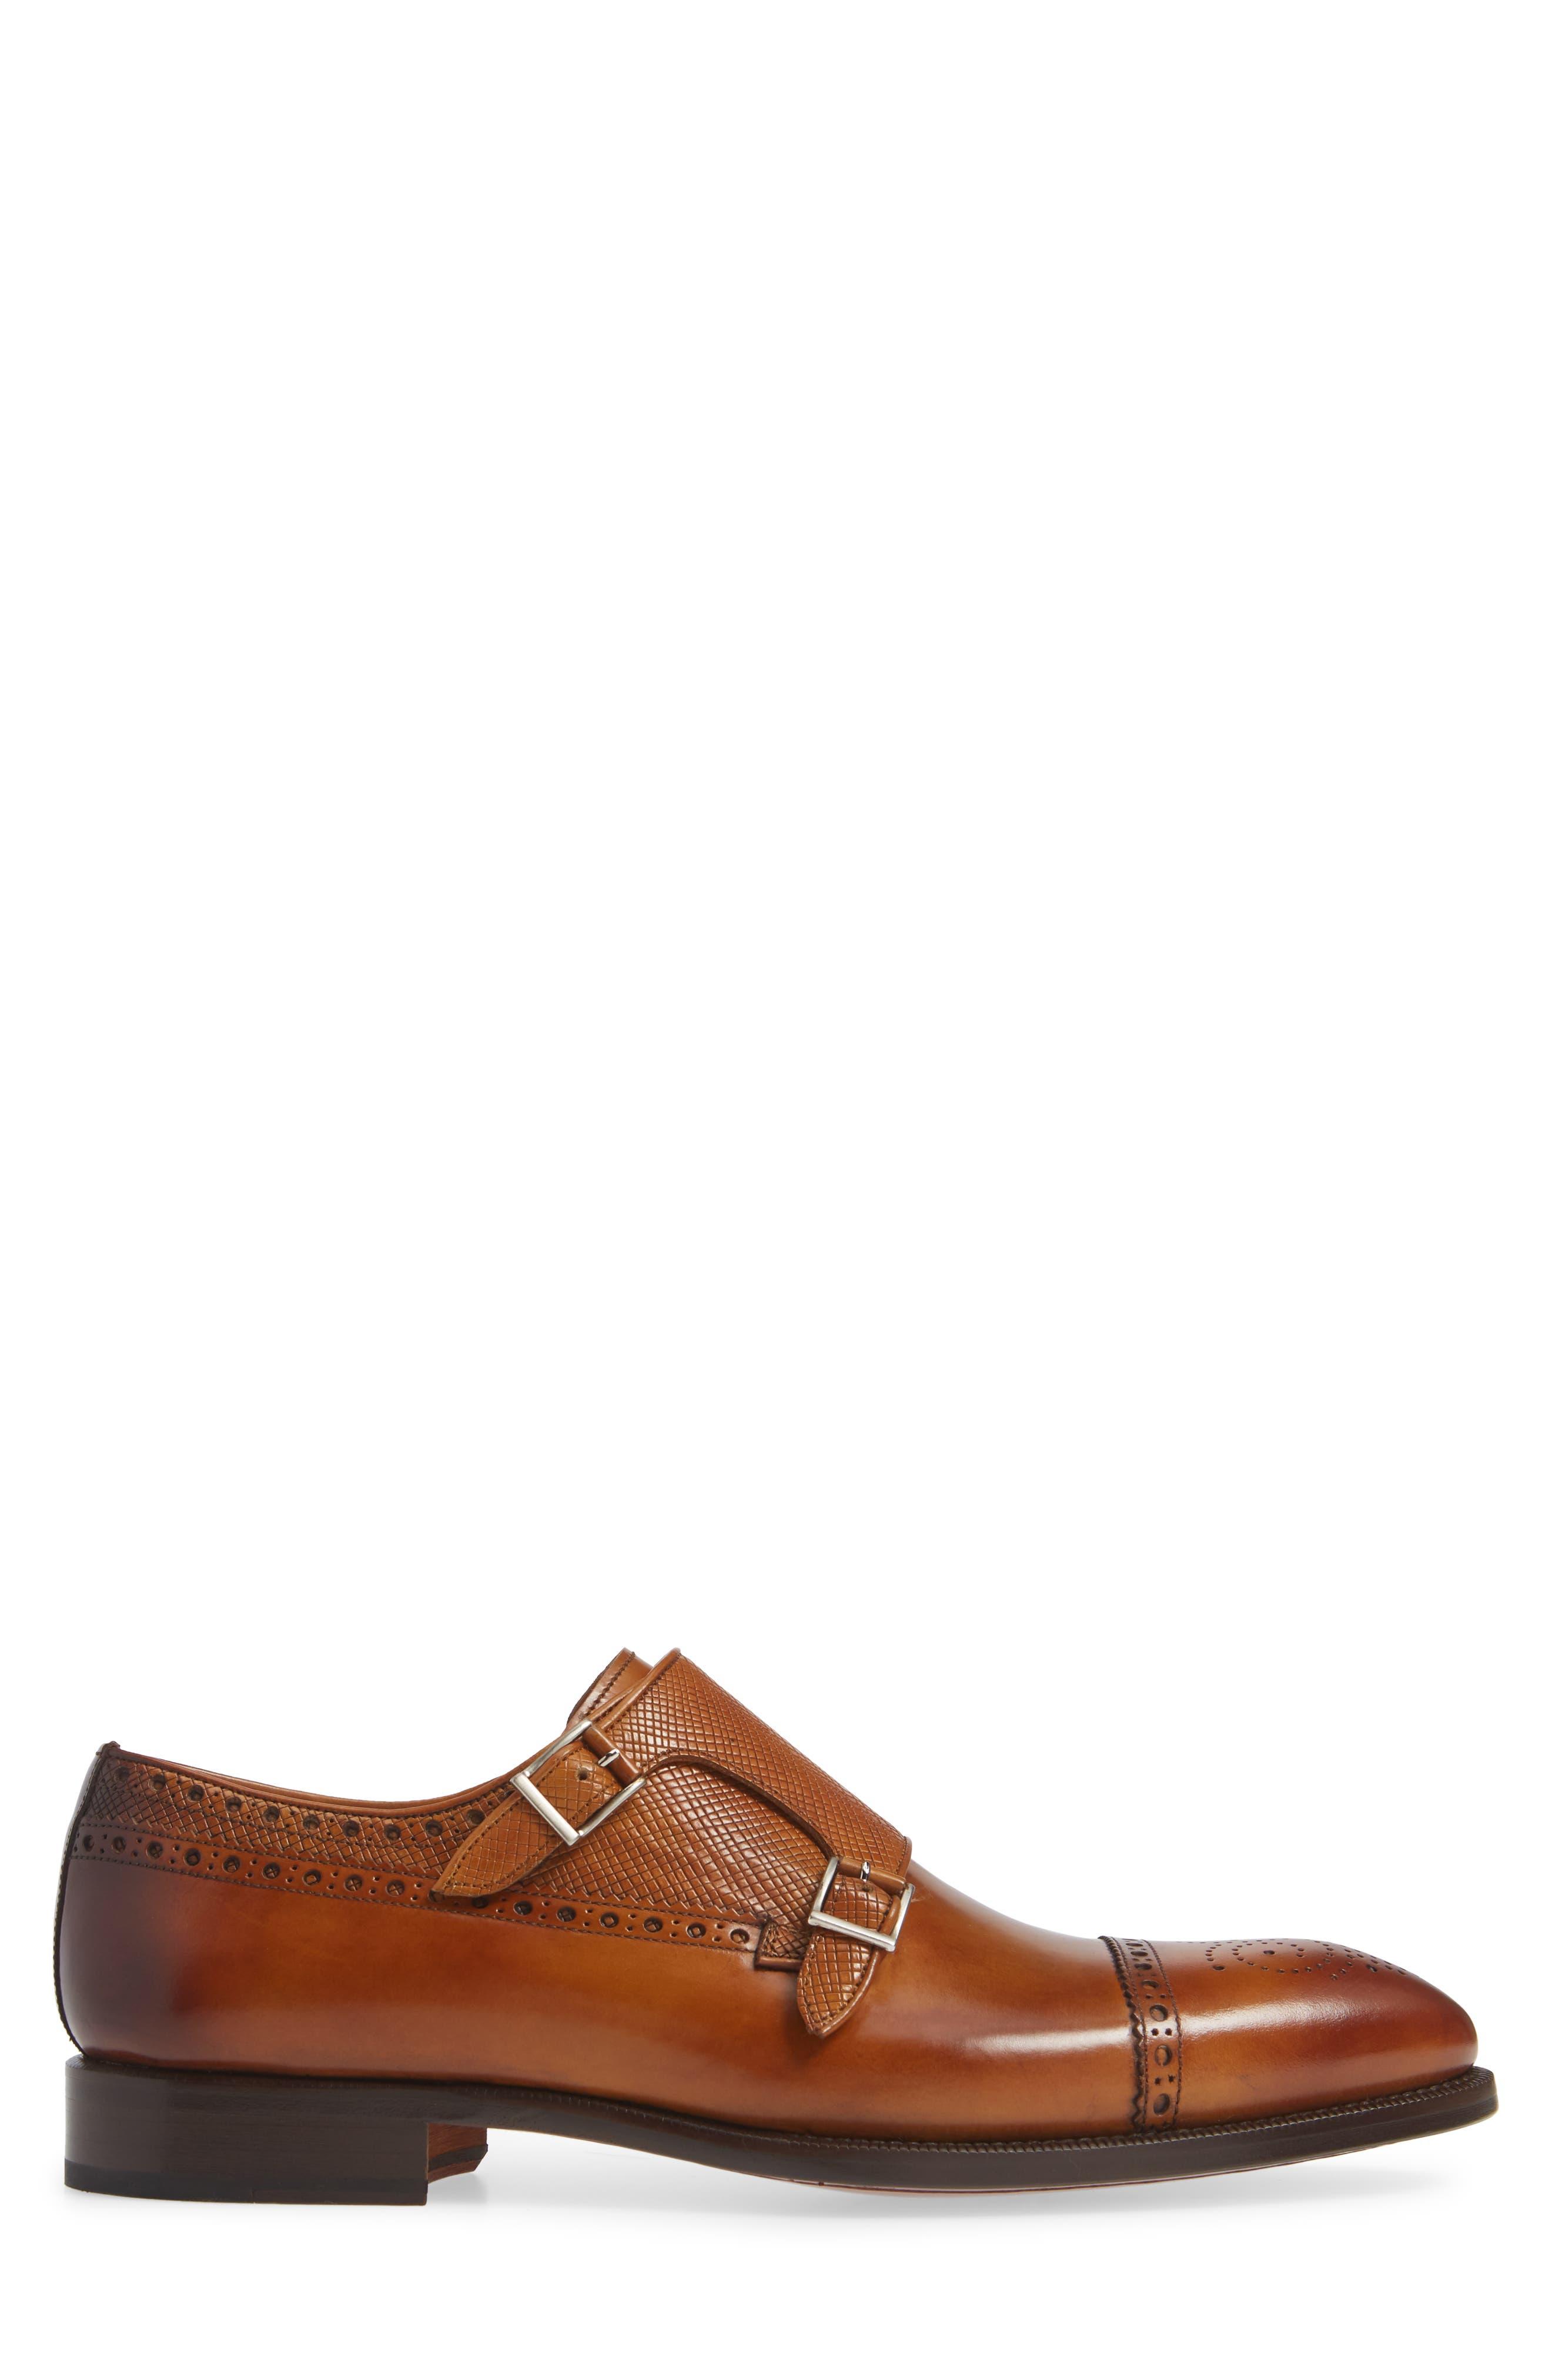 Valda Double Strap Cap Toe Monk Shoe,                             Alternate thumbnail 3, color,                             BROWN LEATHER